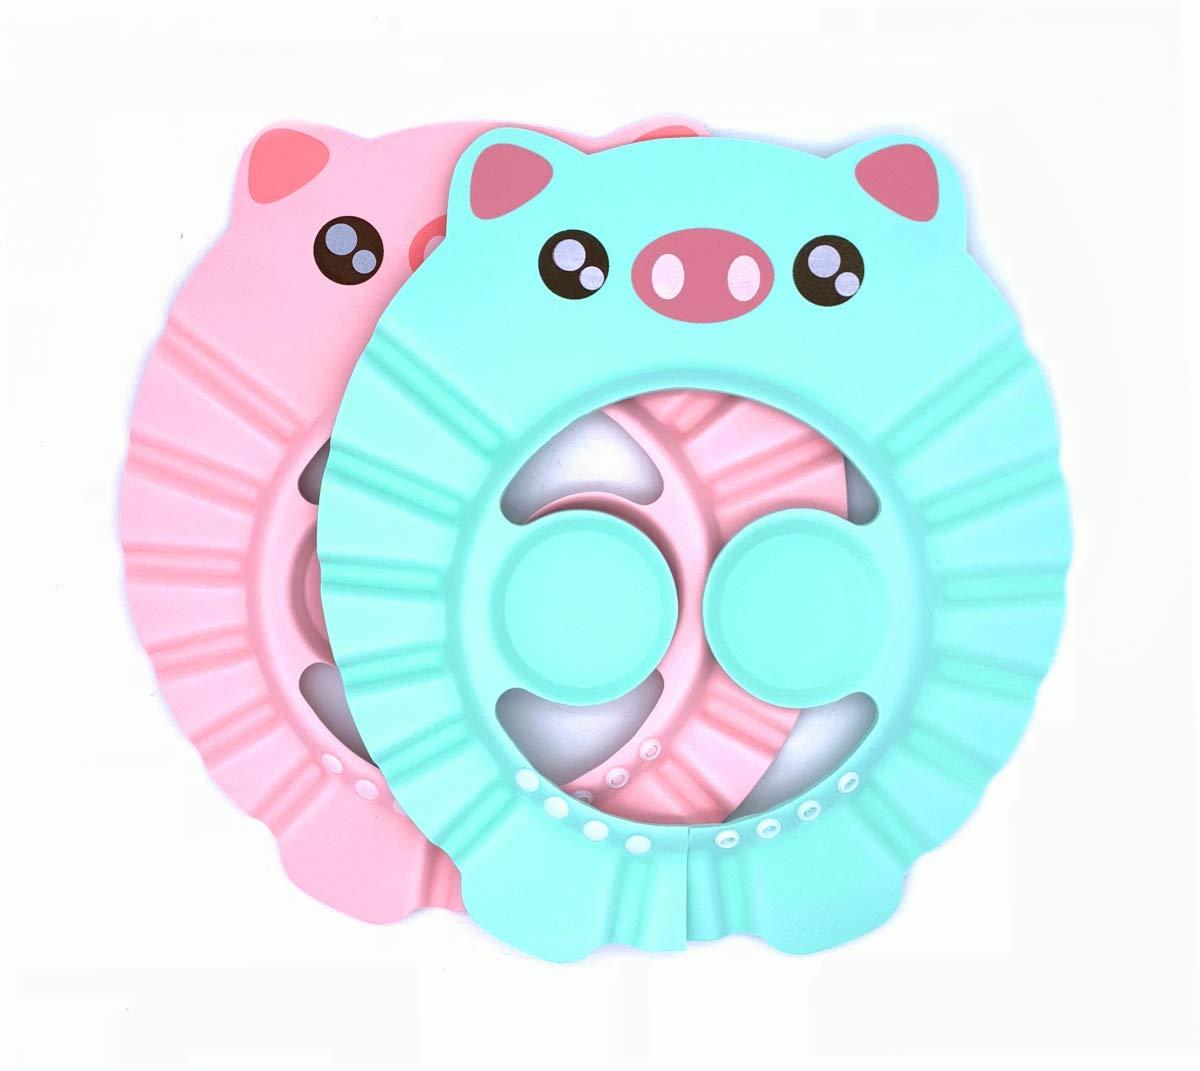 2 Pcs Baby Shower Cap Bathing Cap Soft Adjustable Kids Shampoo Shower Bathing Cap with Ear Protection